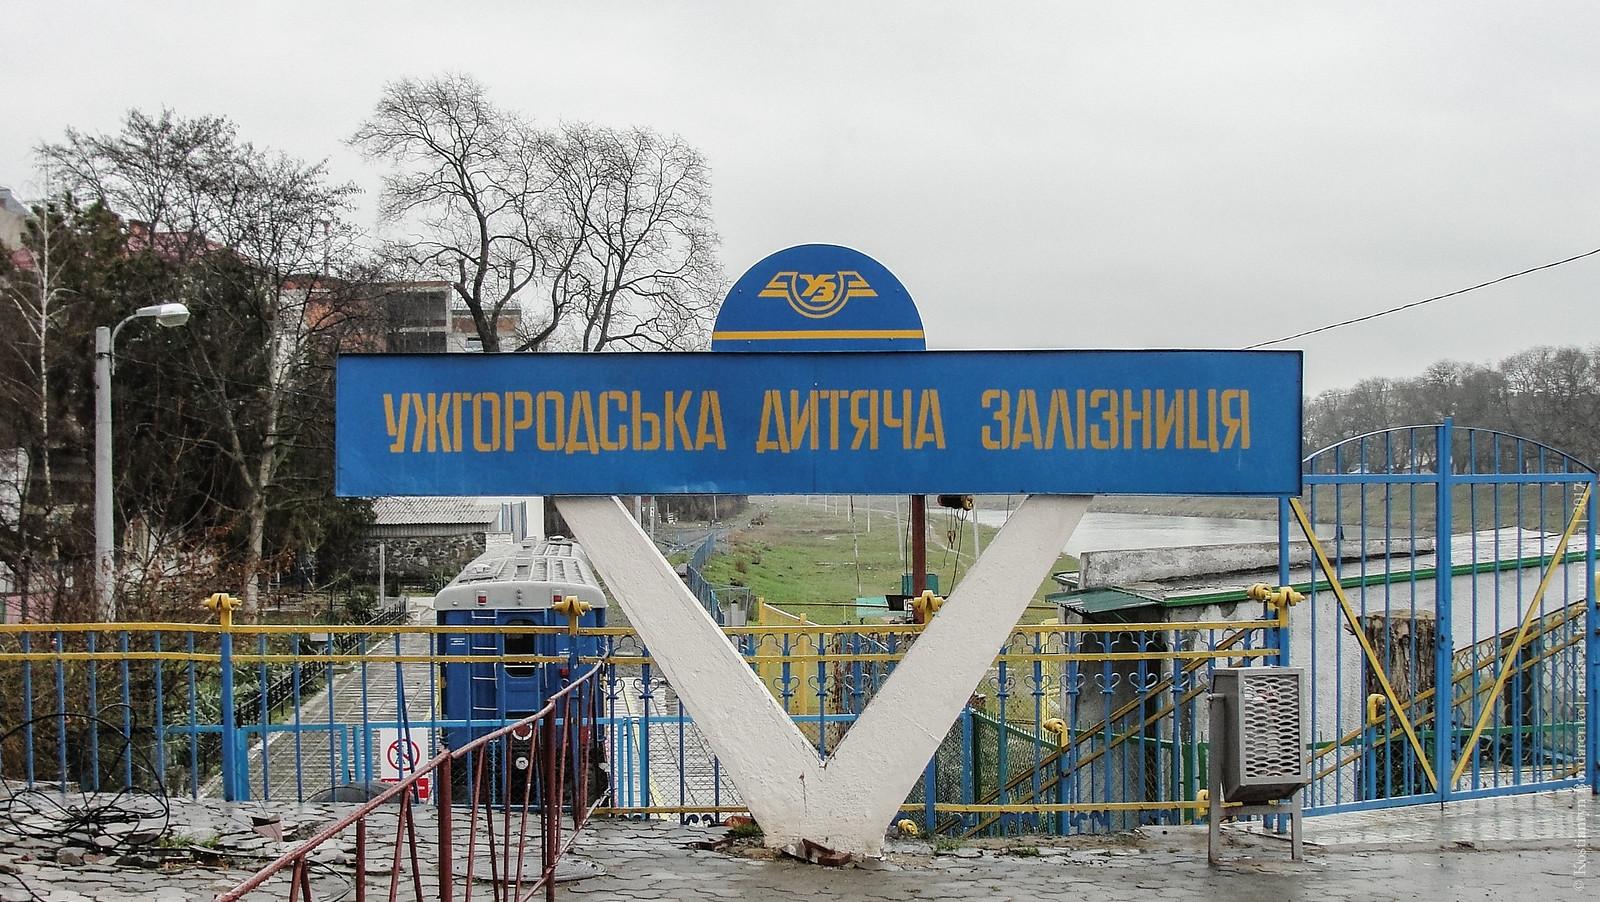 20170318 - Uzhgorod-12